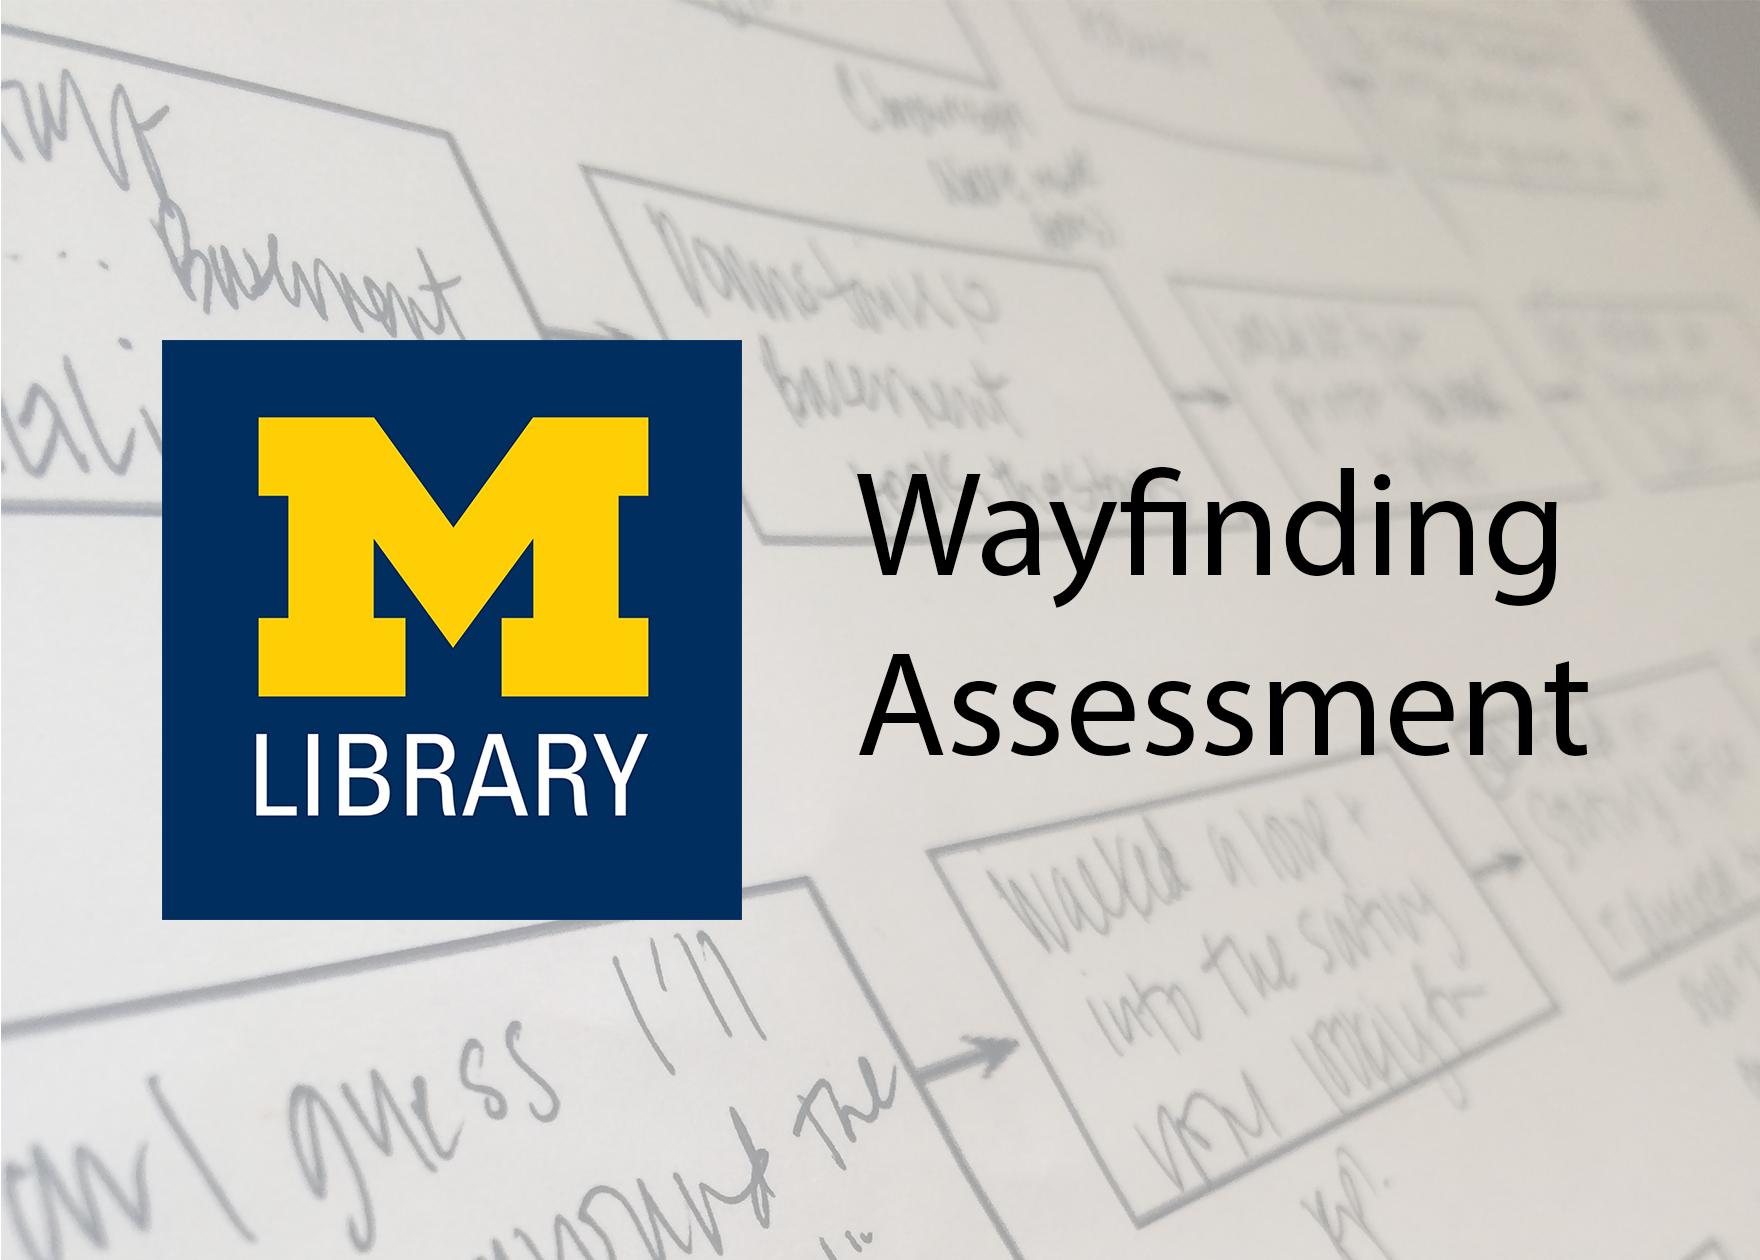 University of Michigan Wayfinding project